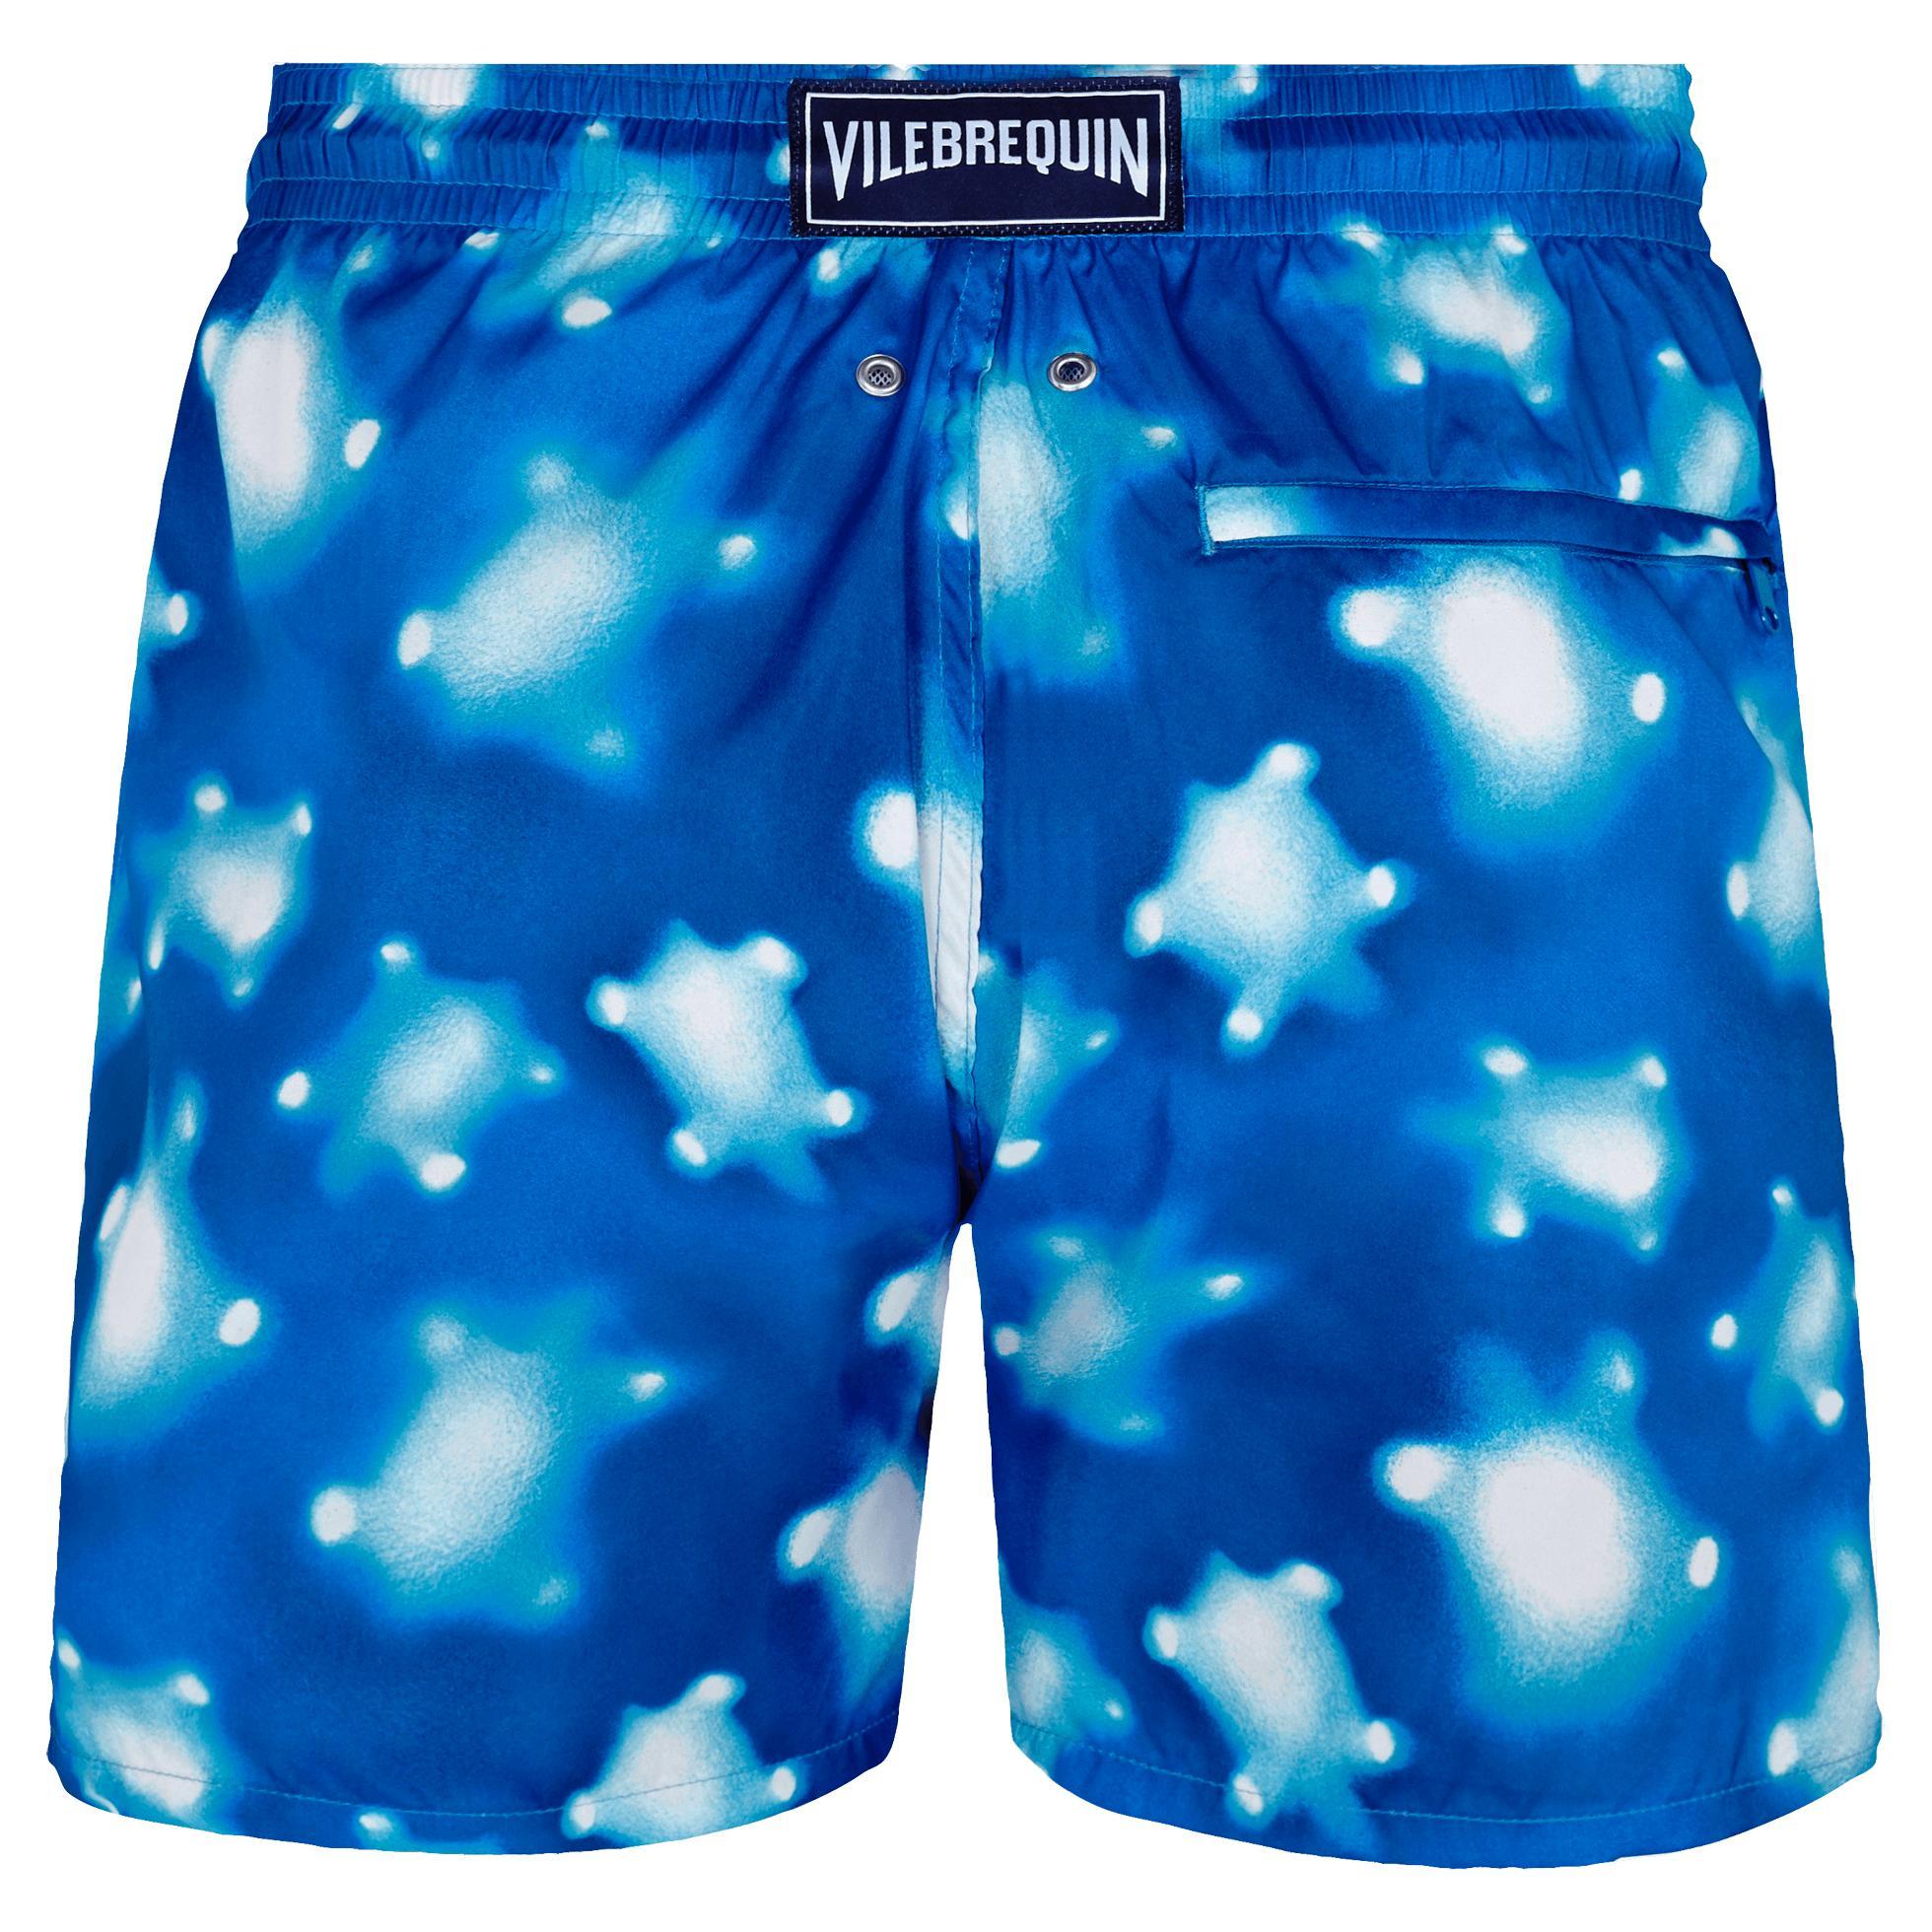 9d4a5941f9 Vilebrequin - Blue Men Swim Trunks Ultra-light And Packable Crystal Turtles  for Men -. View fullscreen